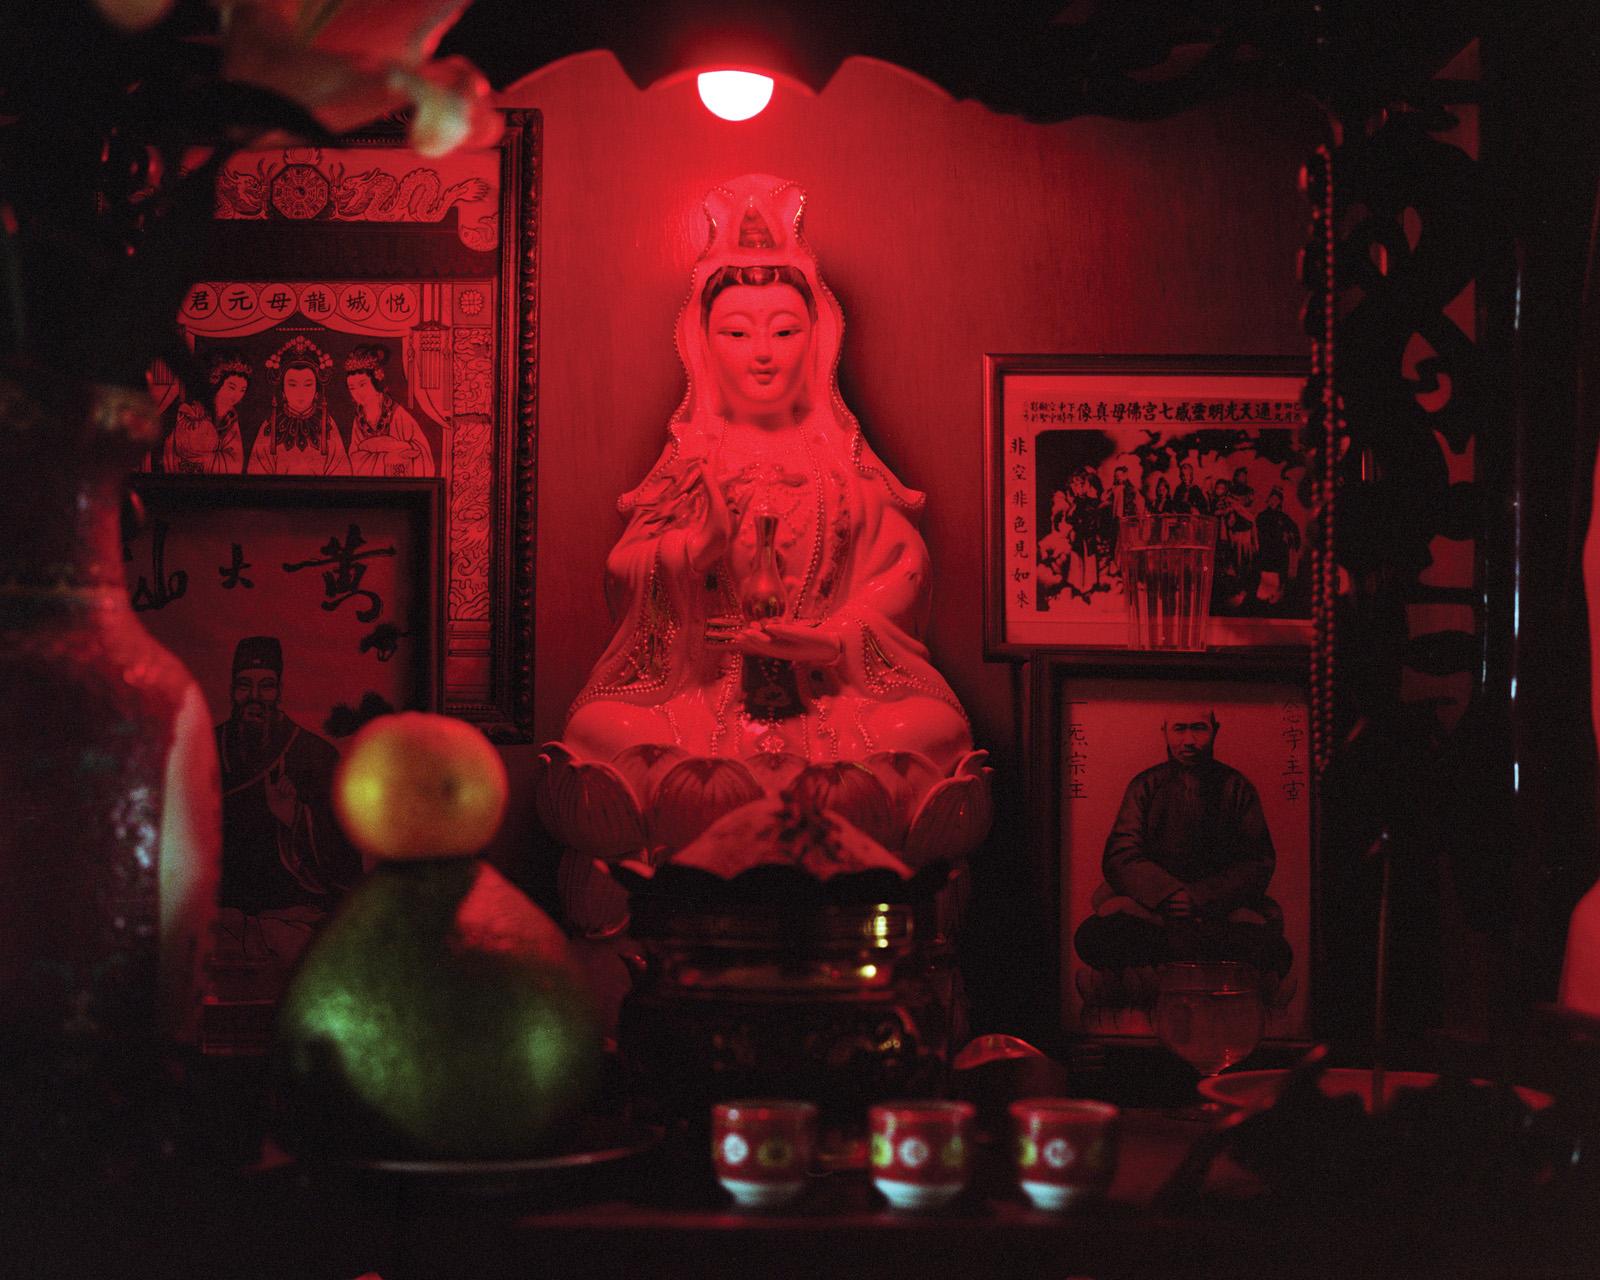 kurt-tong-photography-of-china-Combing For Ice and Jade03.jpg